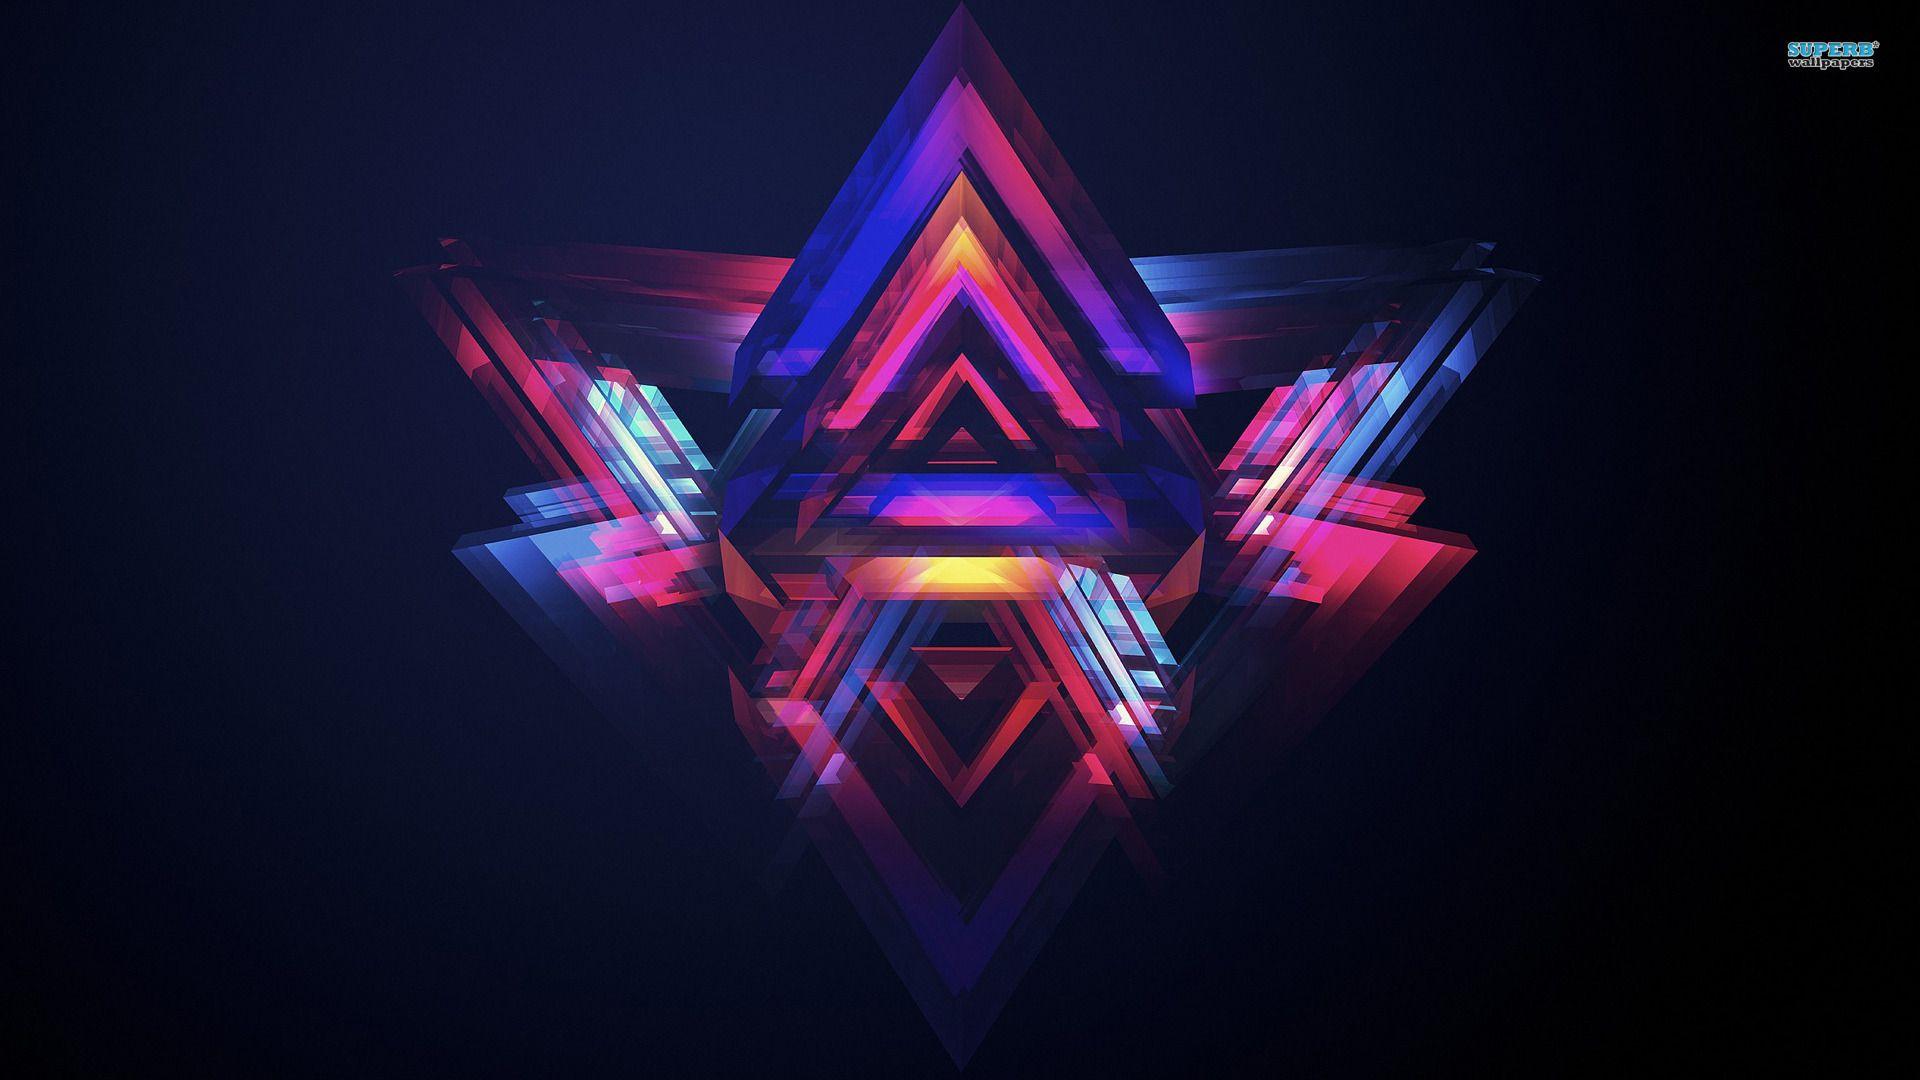 illuminati symbol wallpaper 1920x1080 - photo #26